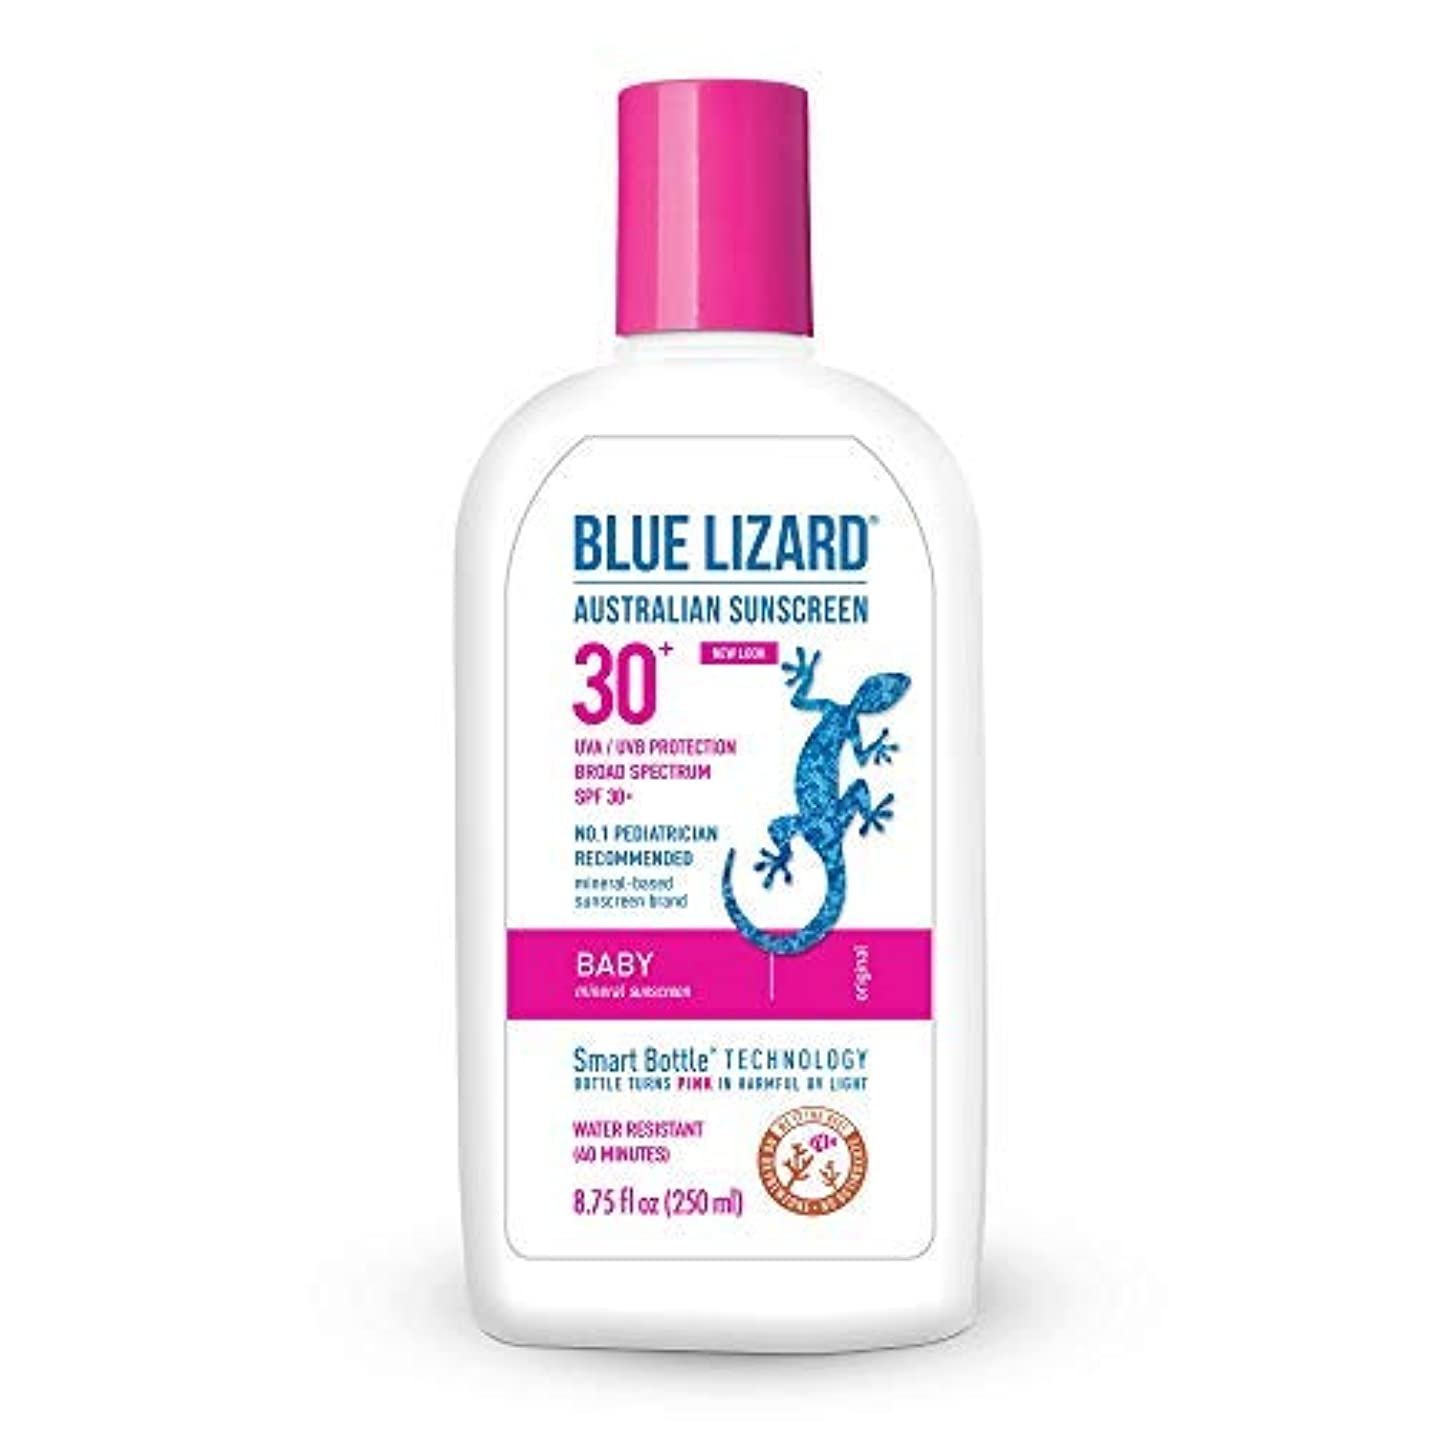 潜水艦適用済み参照Blue Lizard Spf#30+ Baby Australian Sunscreen 260 ml (並行輸入品)